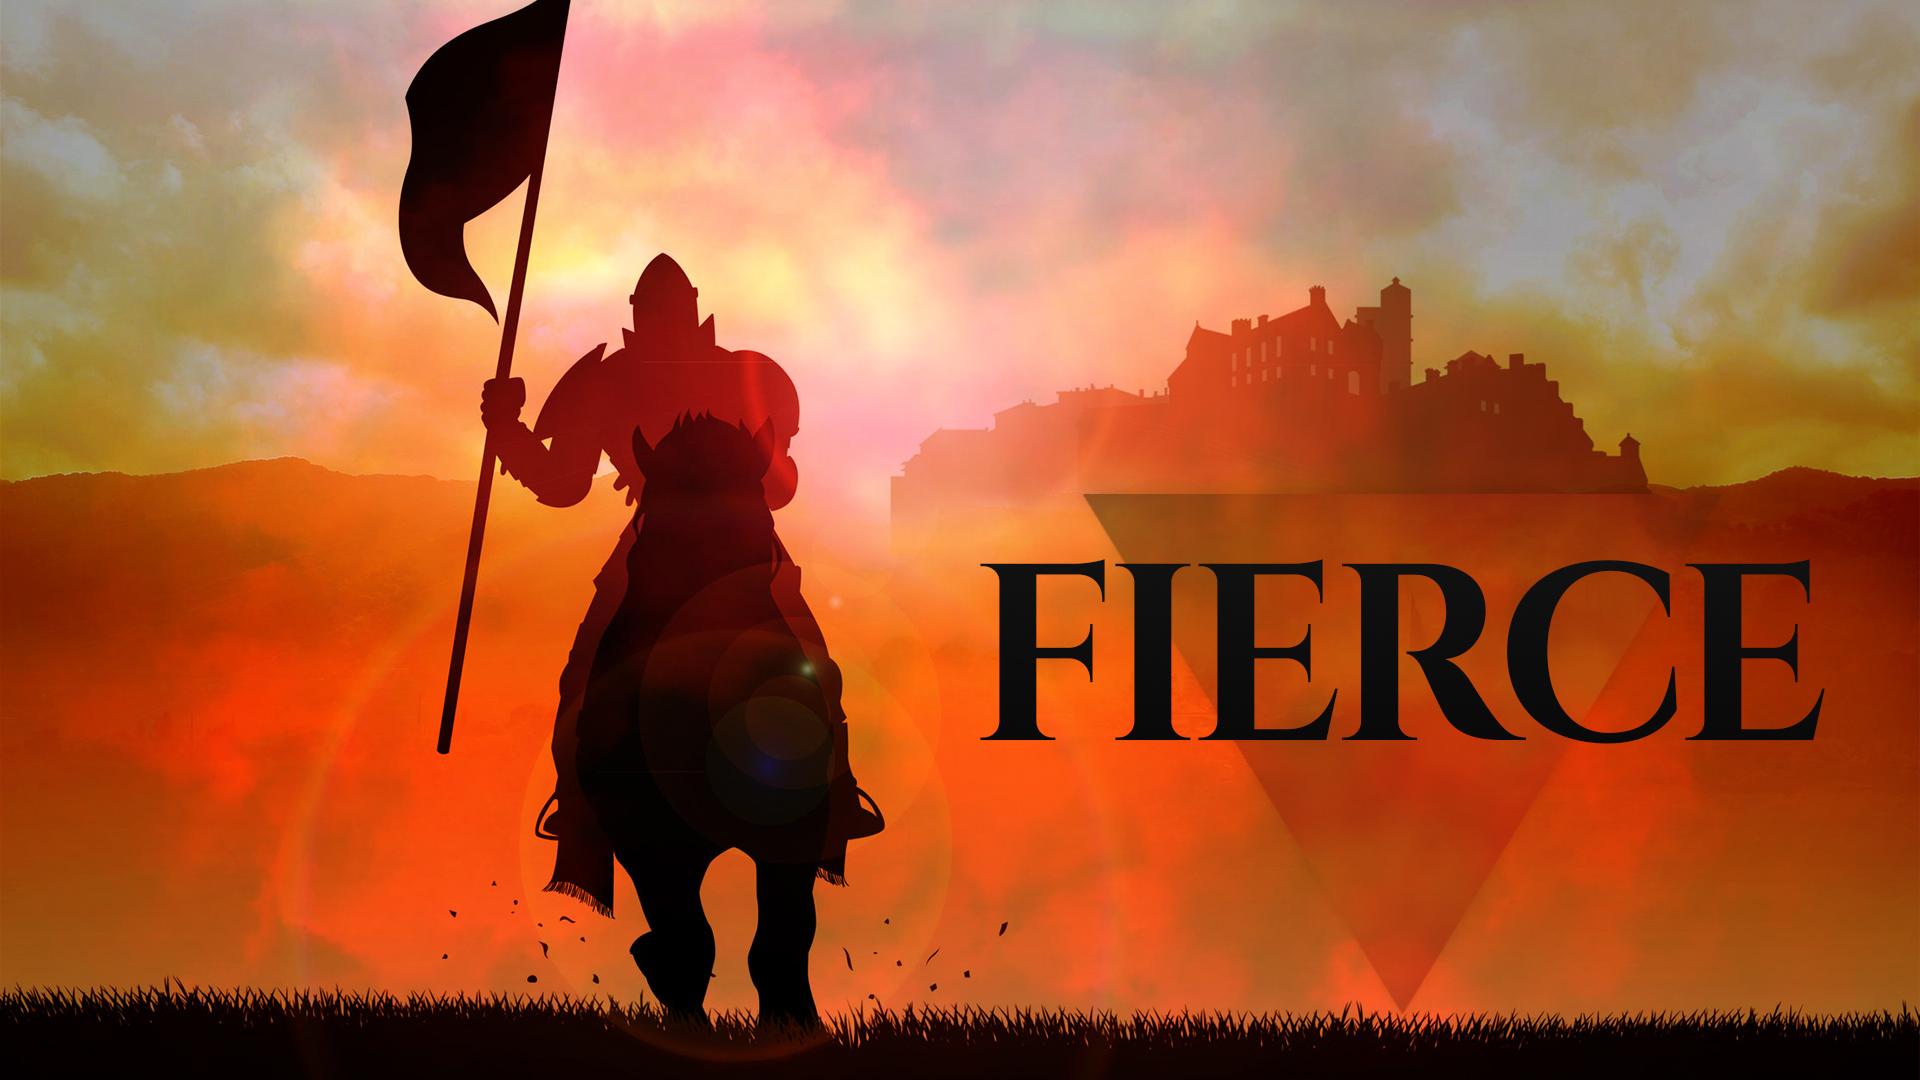 Fierce-Final-Chelan.jpg